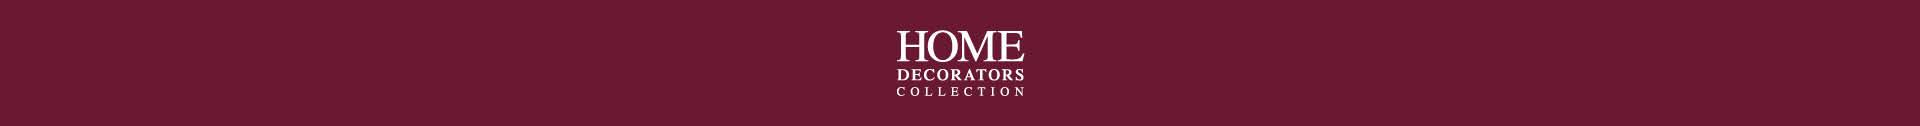 Home Decorators Collection logo banner